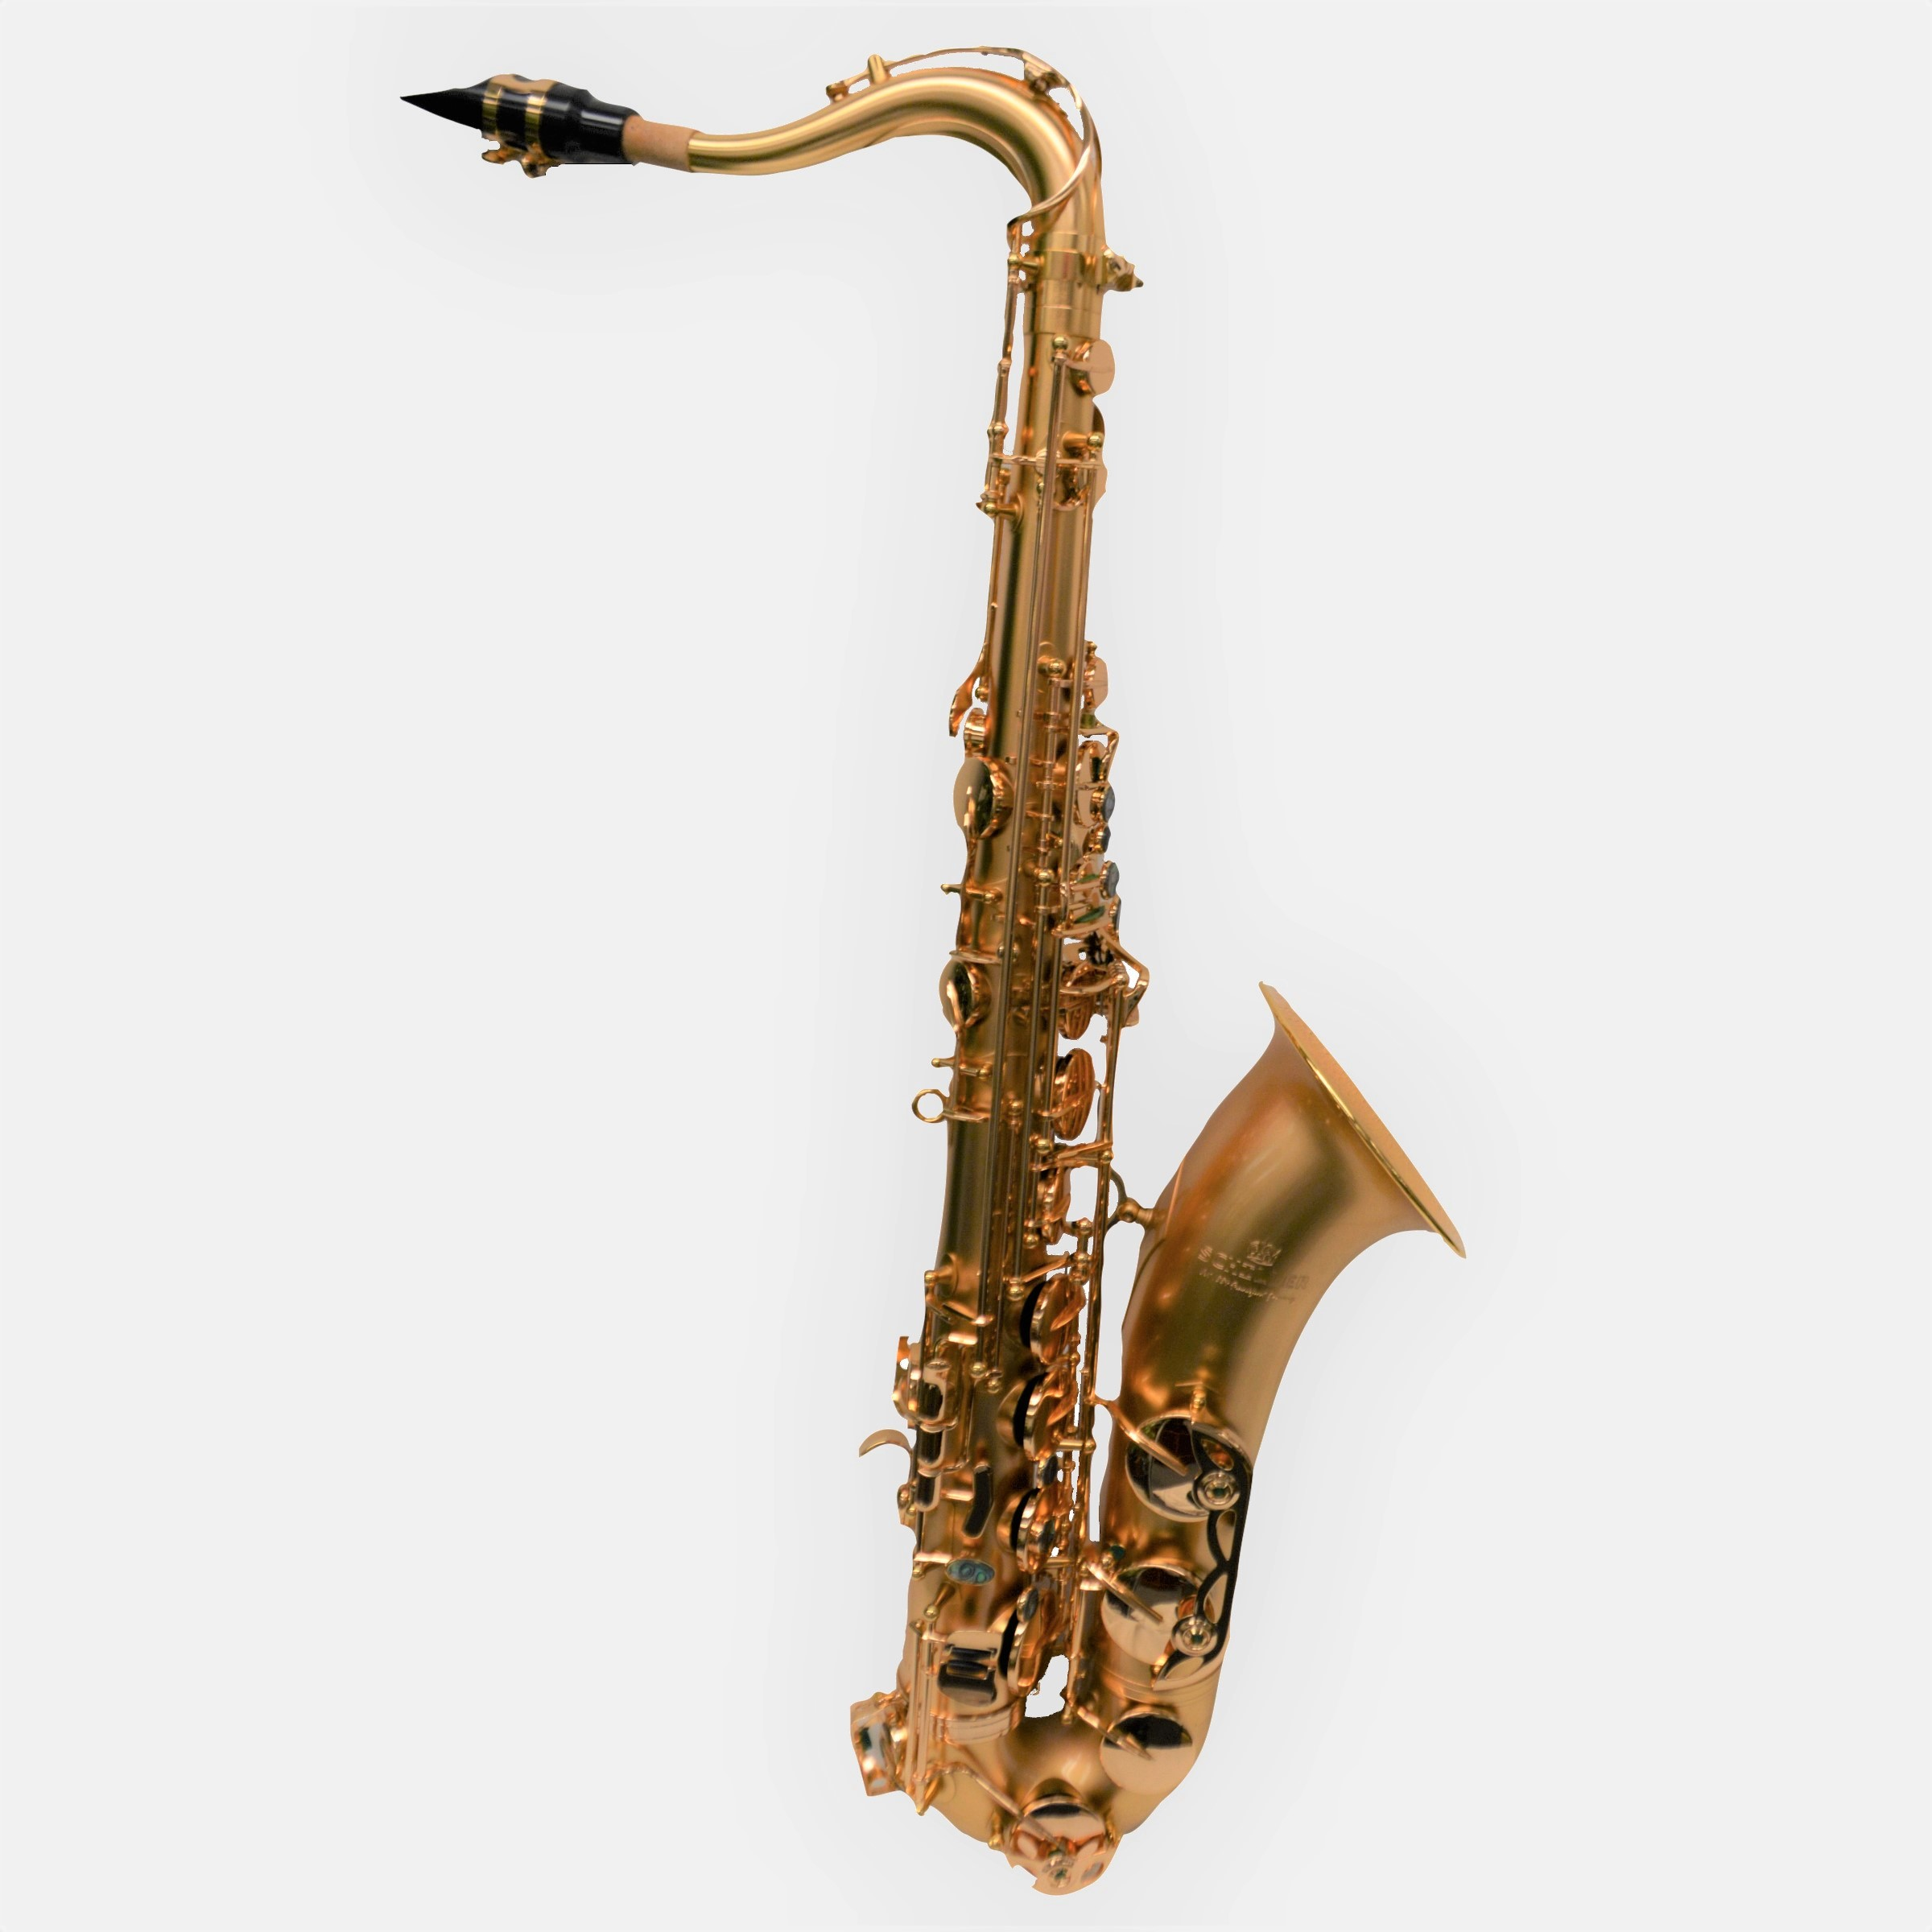 Schiller Elite Luxus V Tenor Saxophone – Satin Gold